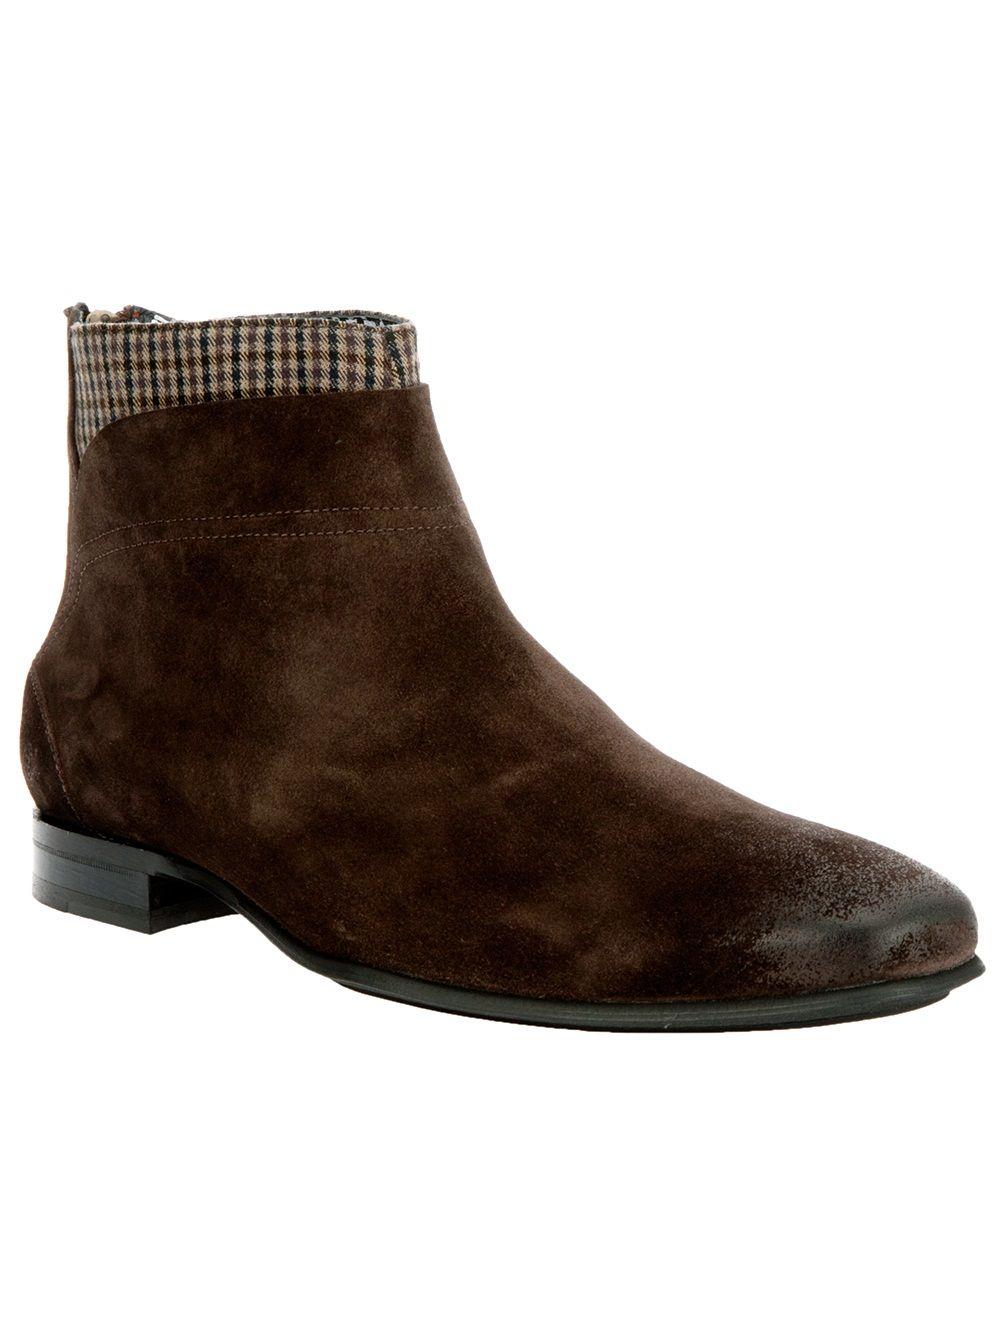 Paul & Joe Checkered Detail Ankle Boot